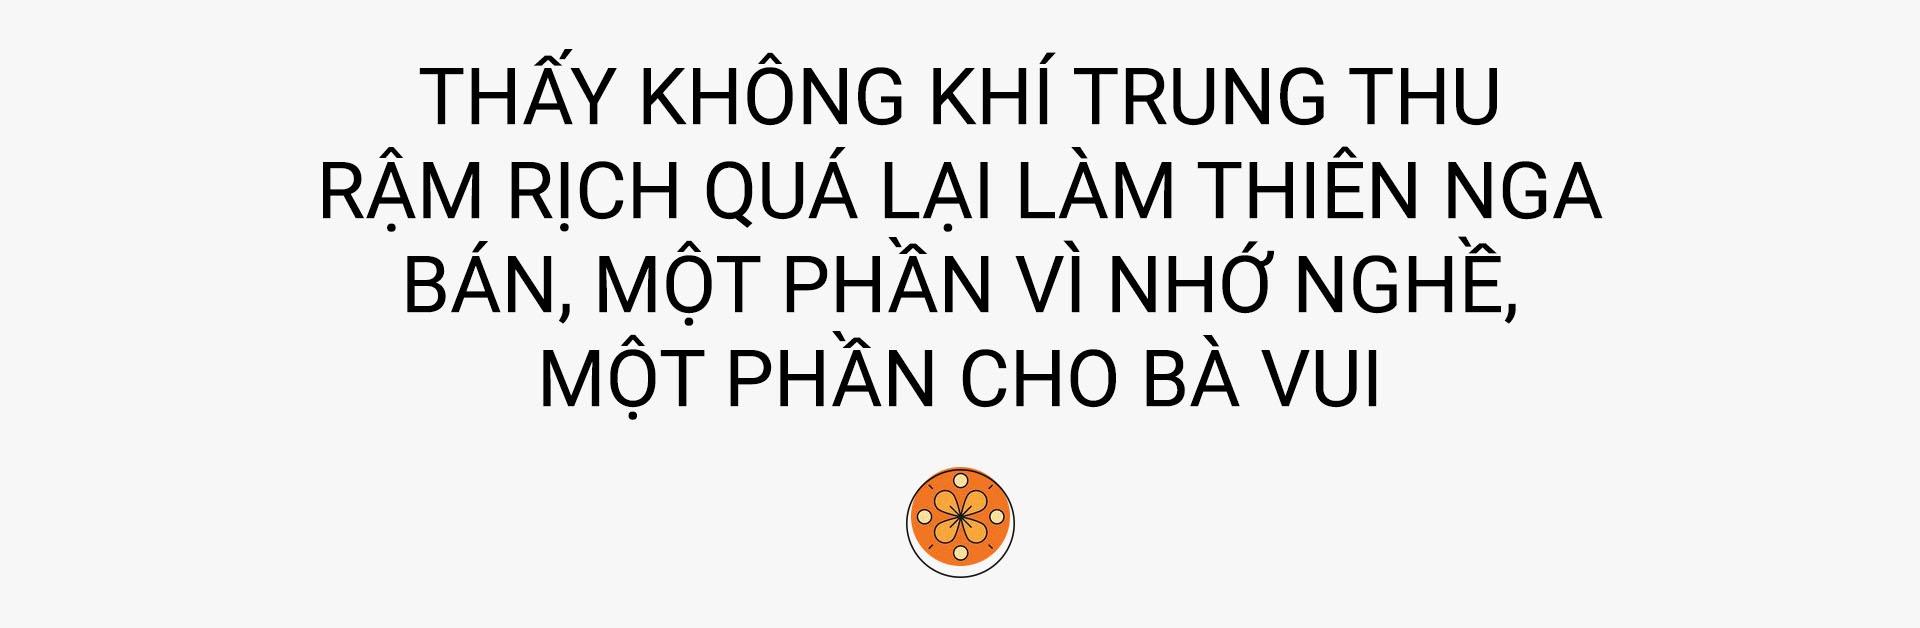 Nhung nguoi luu giu thoi vang son cua Trung thu Ha Noi xua hinh anh 39